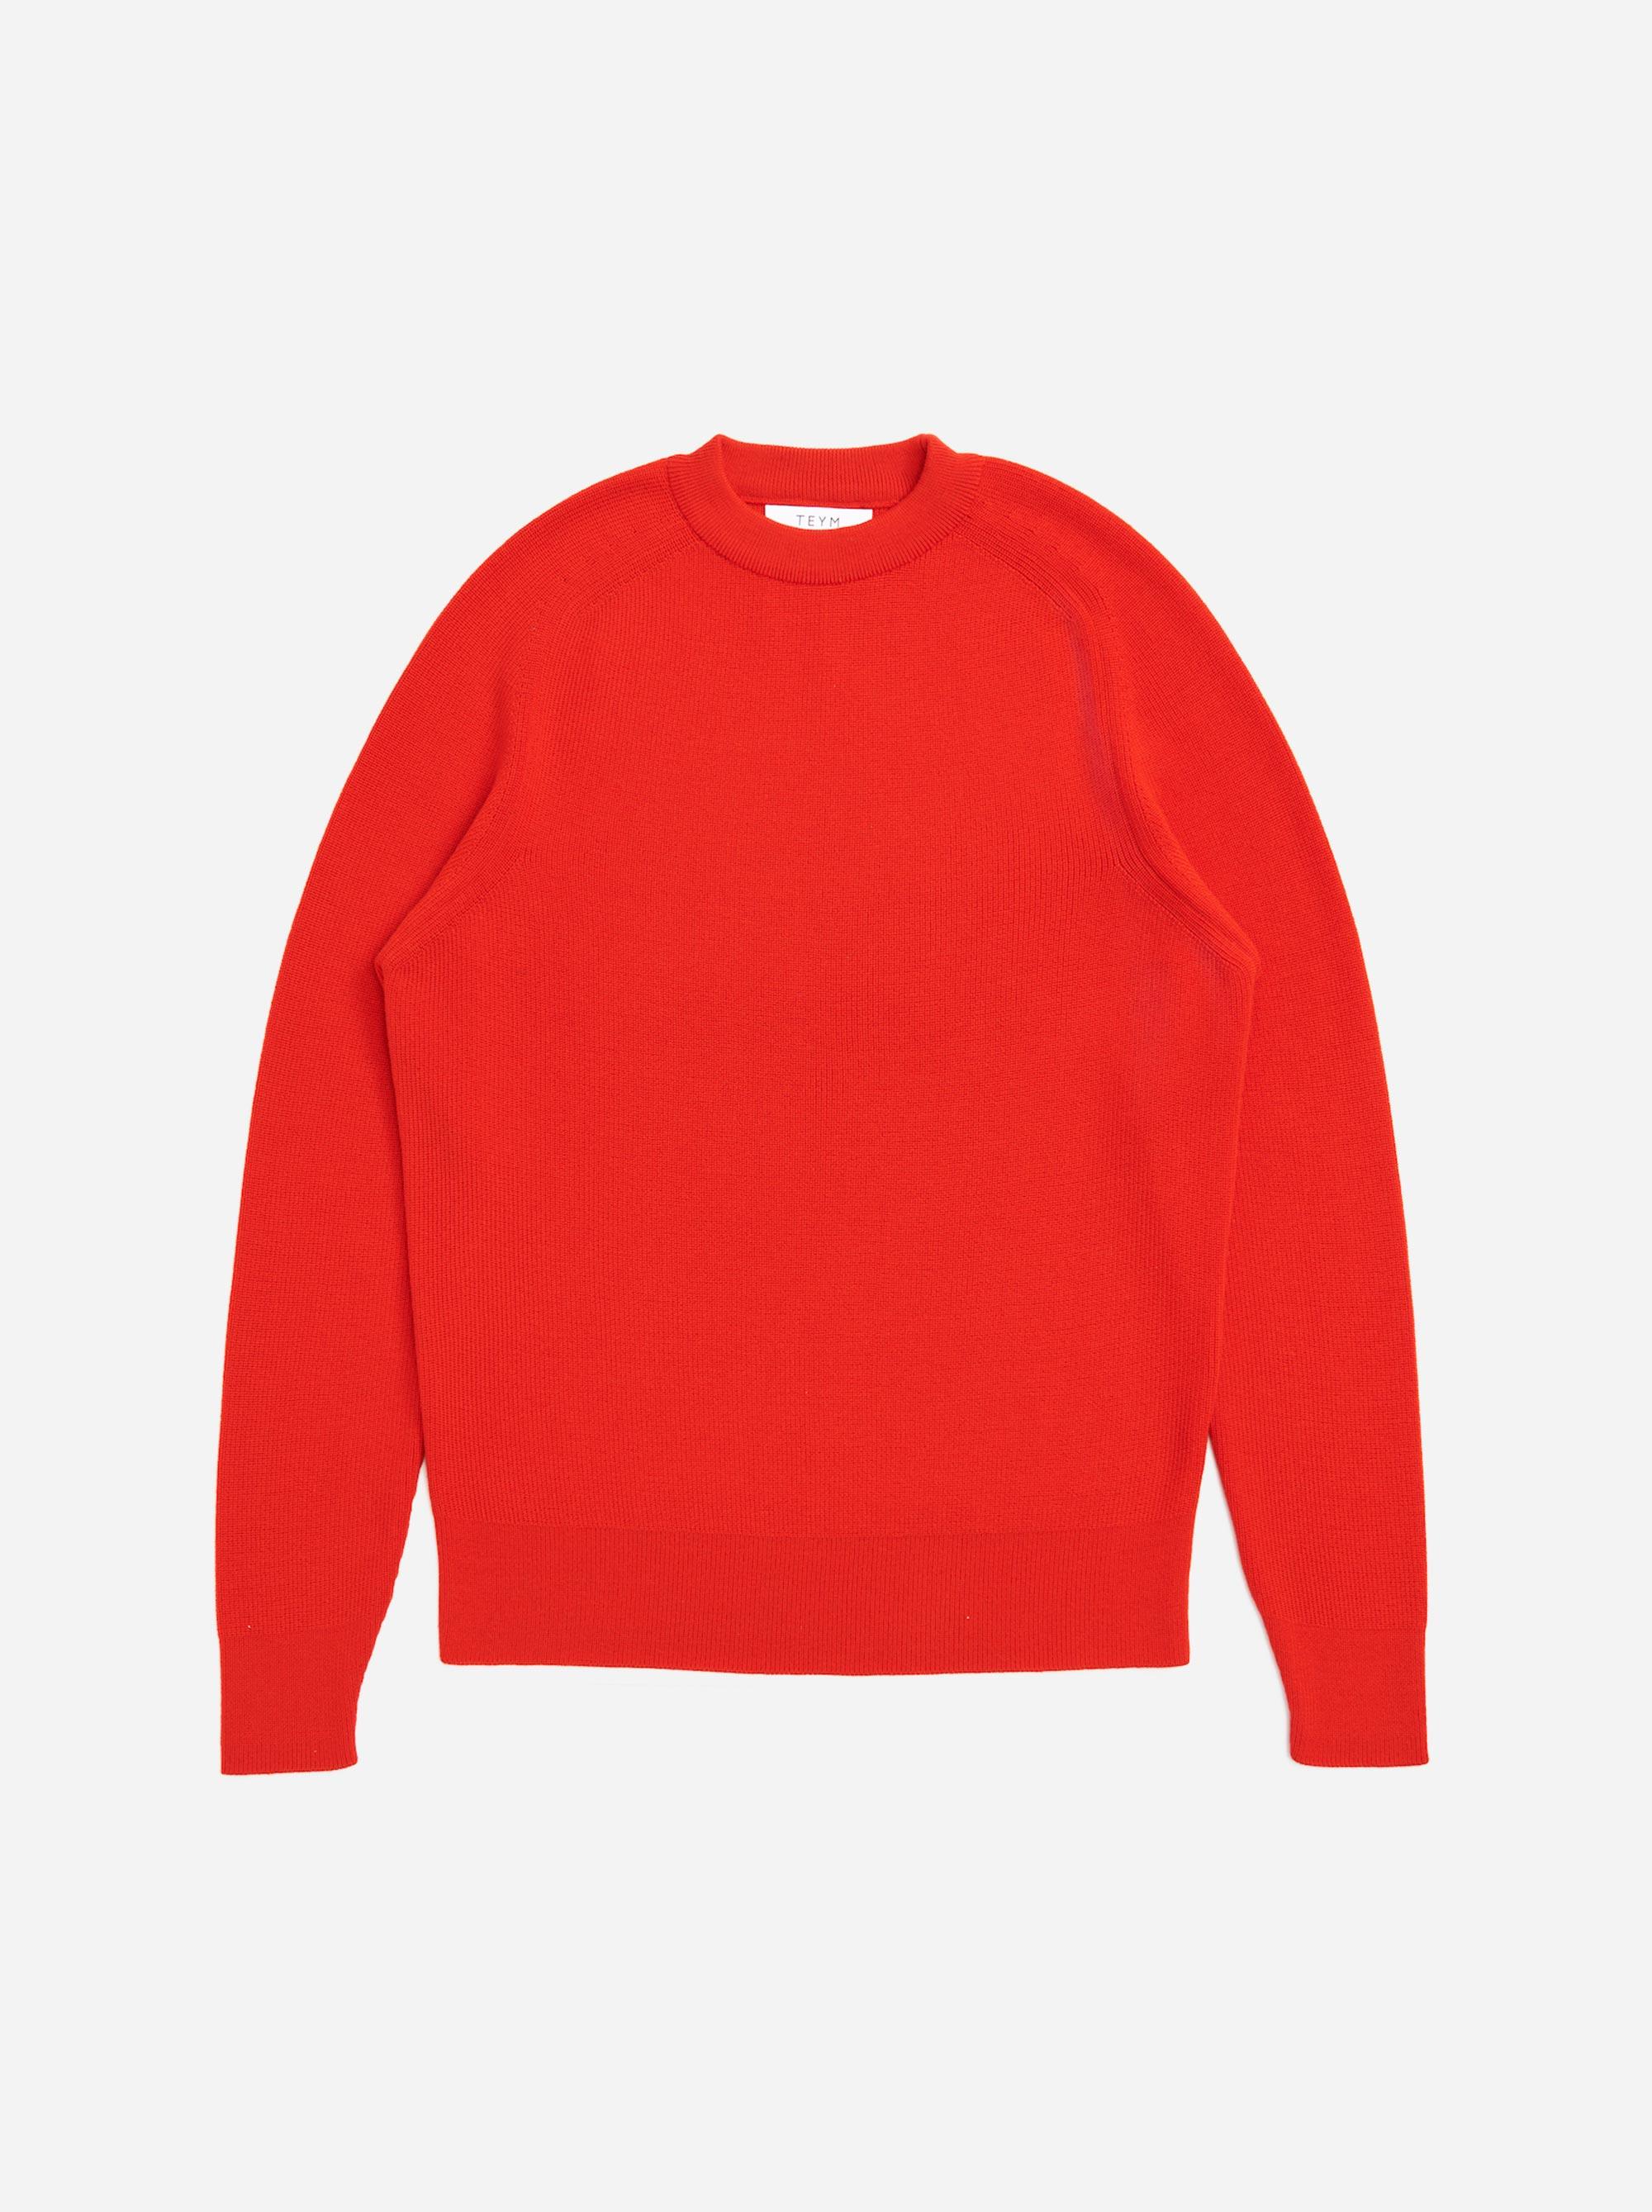 Teym - Crewneck - The Merino Sweater - Women - Red - 4